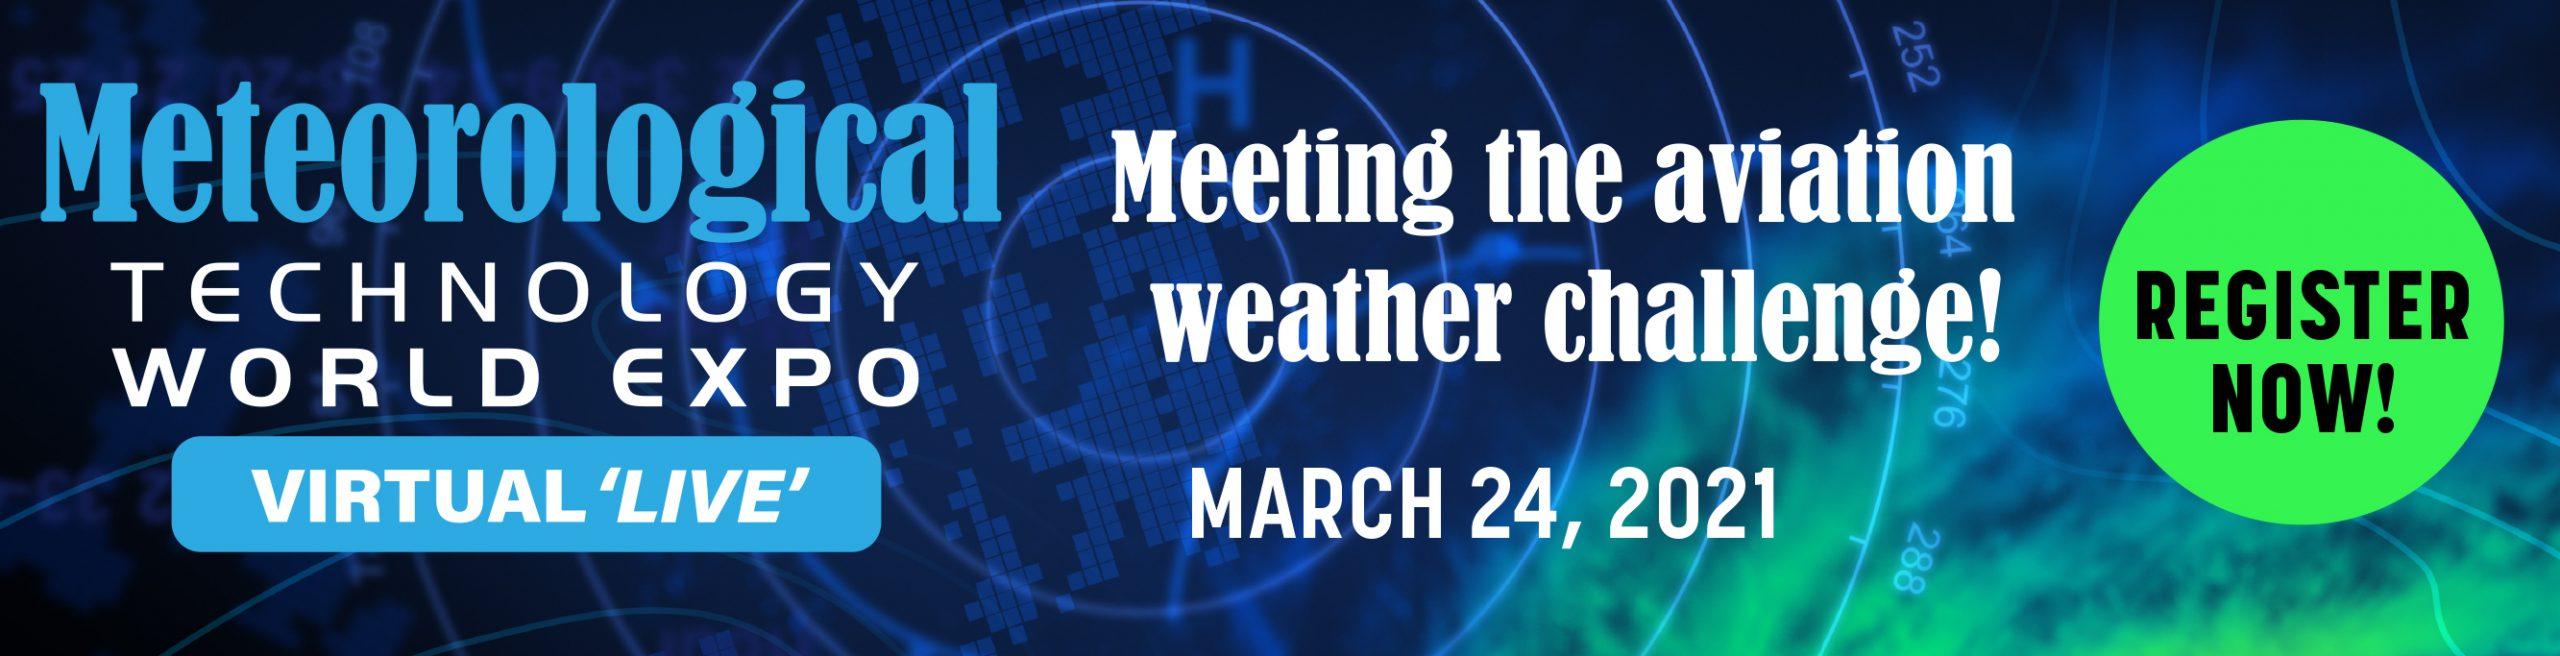 Meteorological Technology World Expo Virtual 'Live' Banner